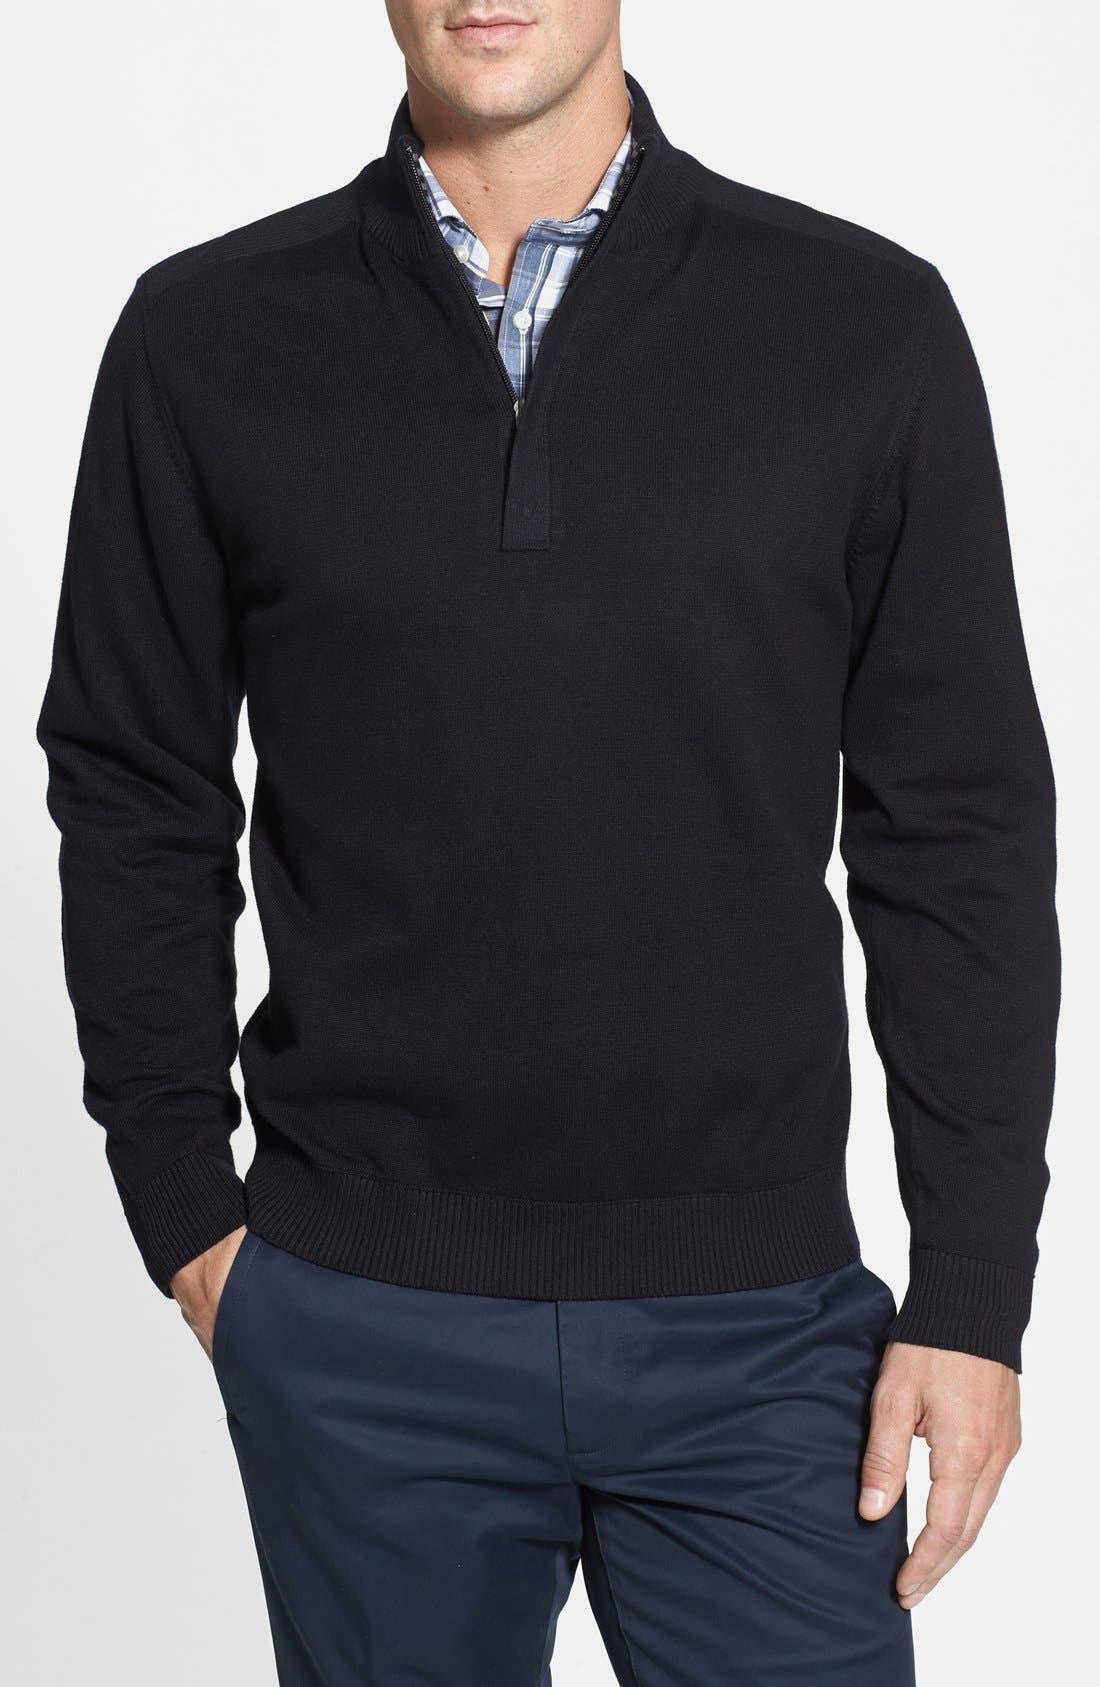 CUTTER & BUCK 'Broadview' Half Zip Sweater